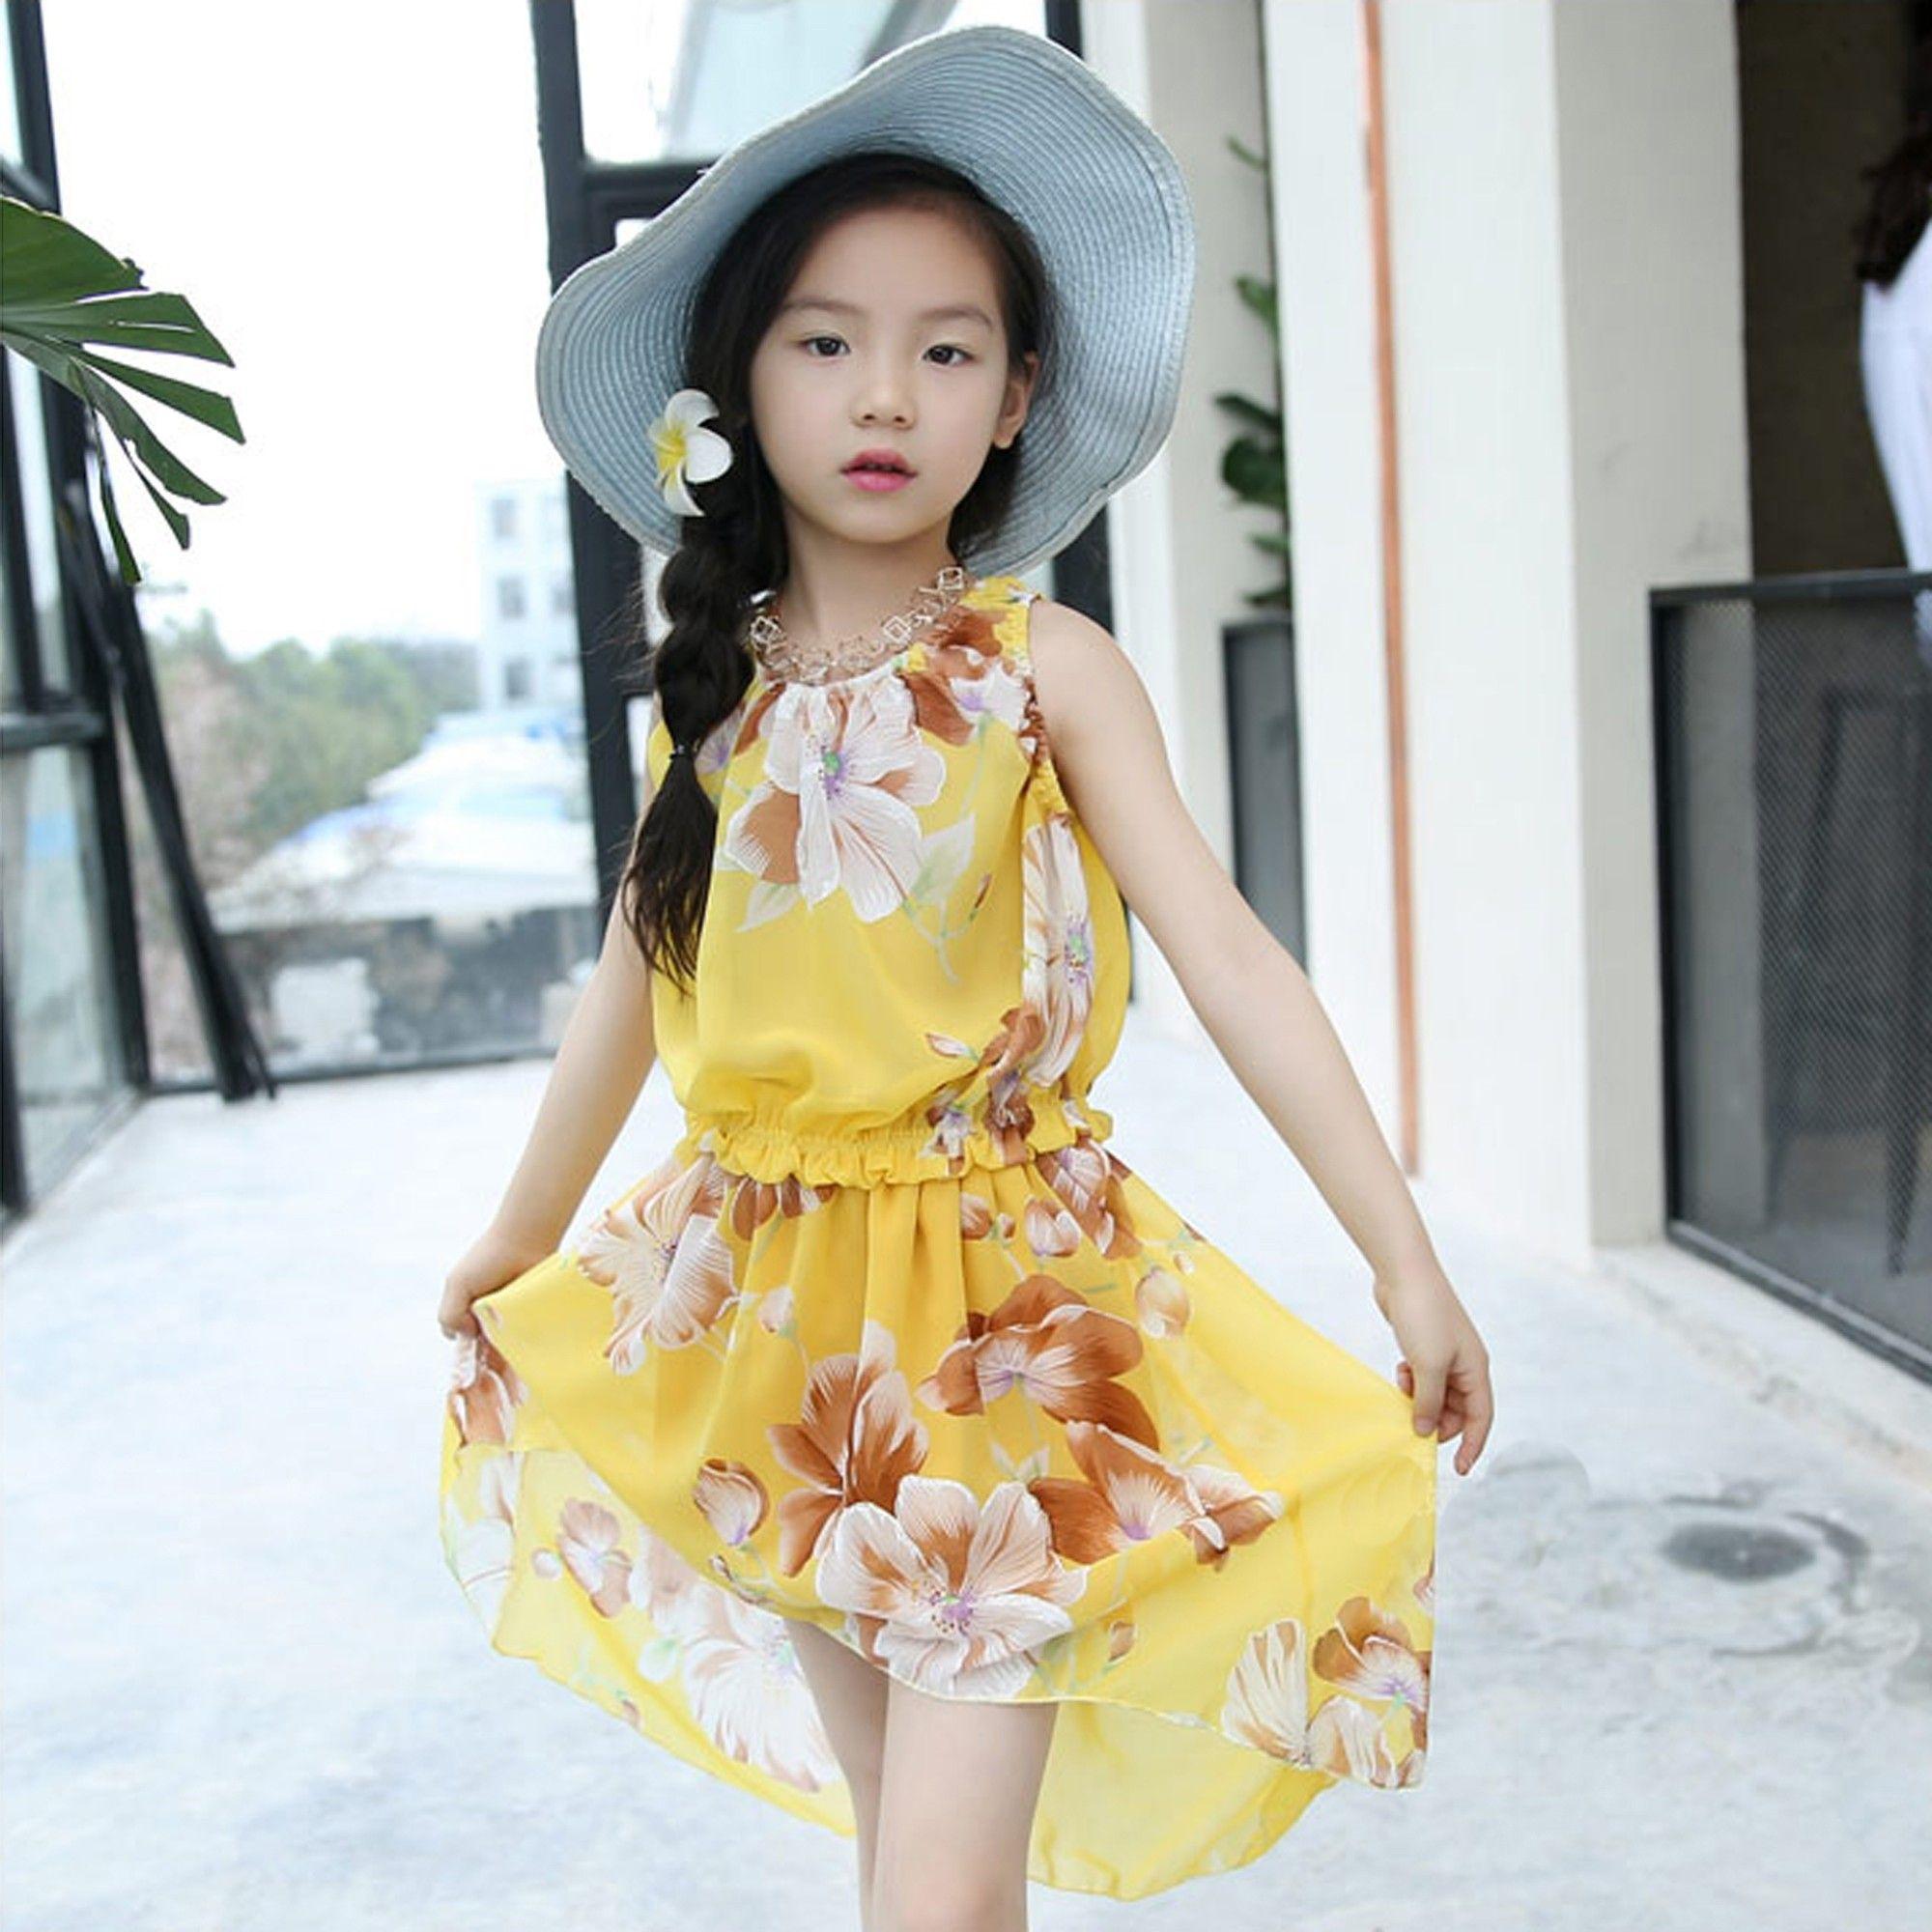 Yellow Floral Print Dress - Lil Mantra